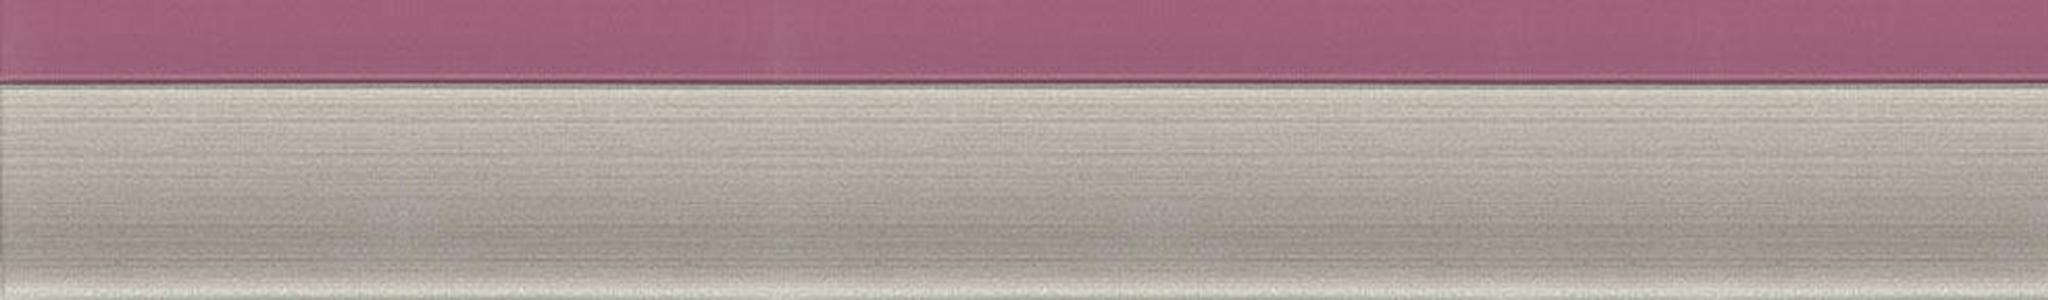 HD 29238 Acryl 3D Edge Steel-Pink